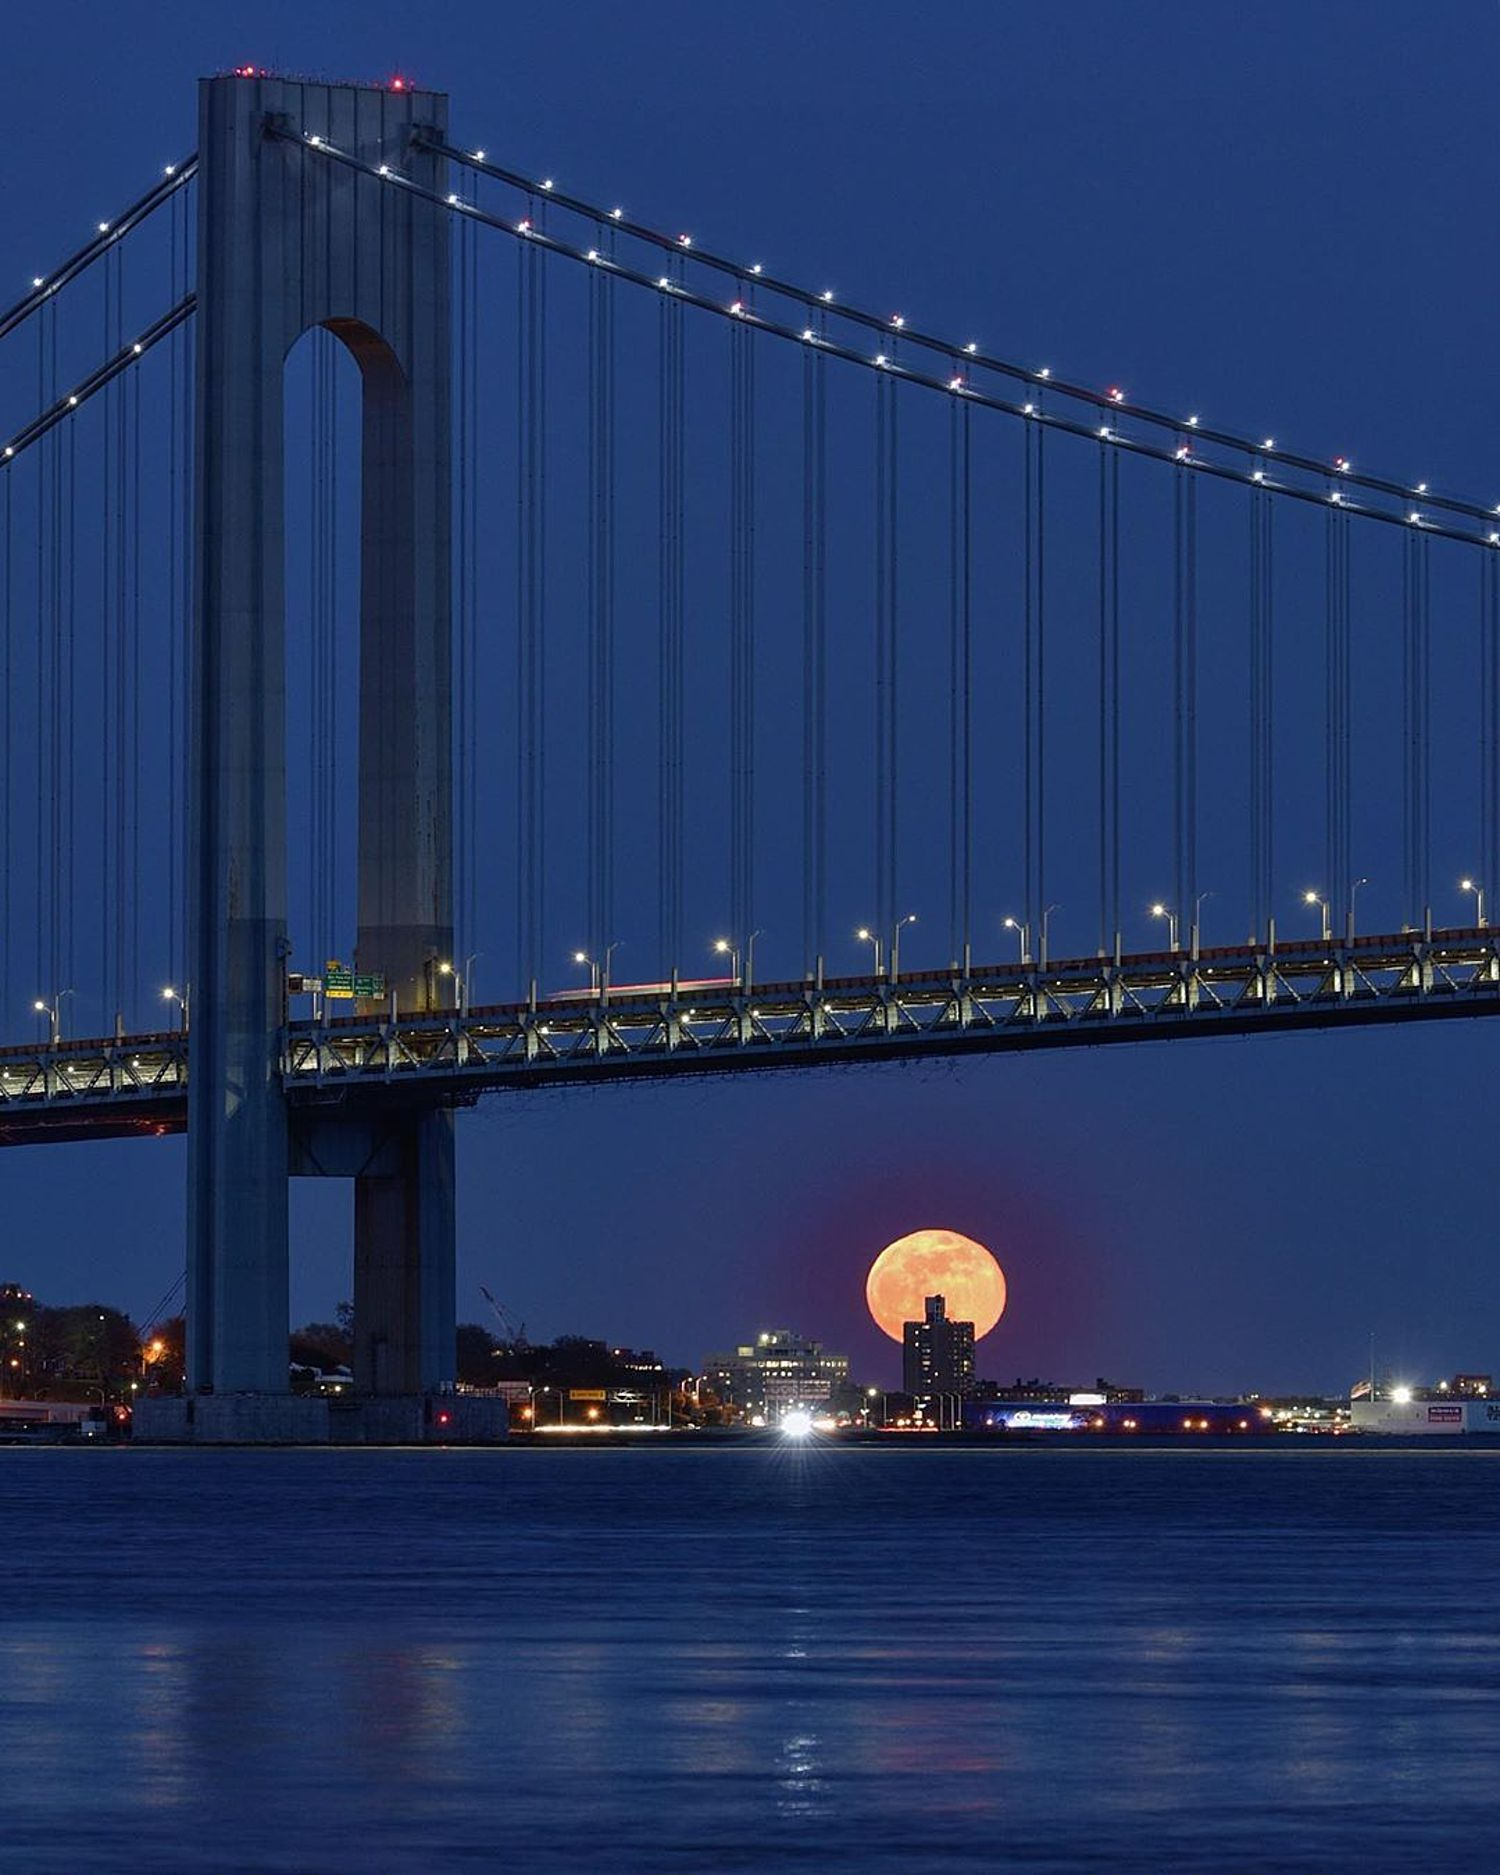 Moonrise and the Verrazano-Narrows Bridge, New York